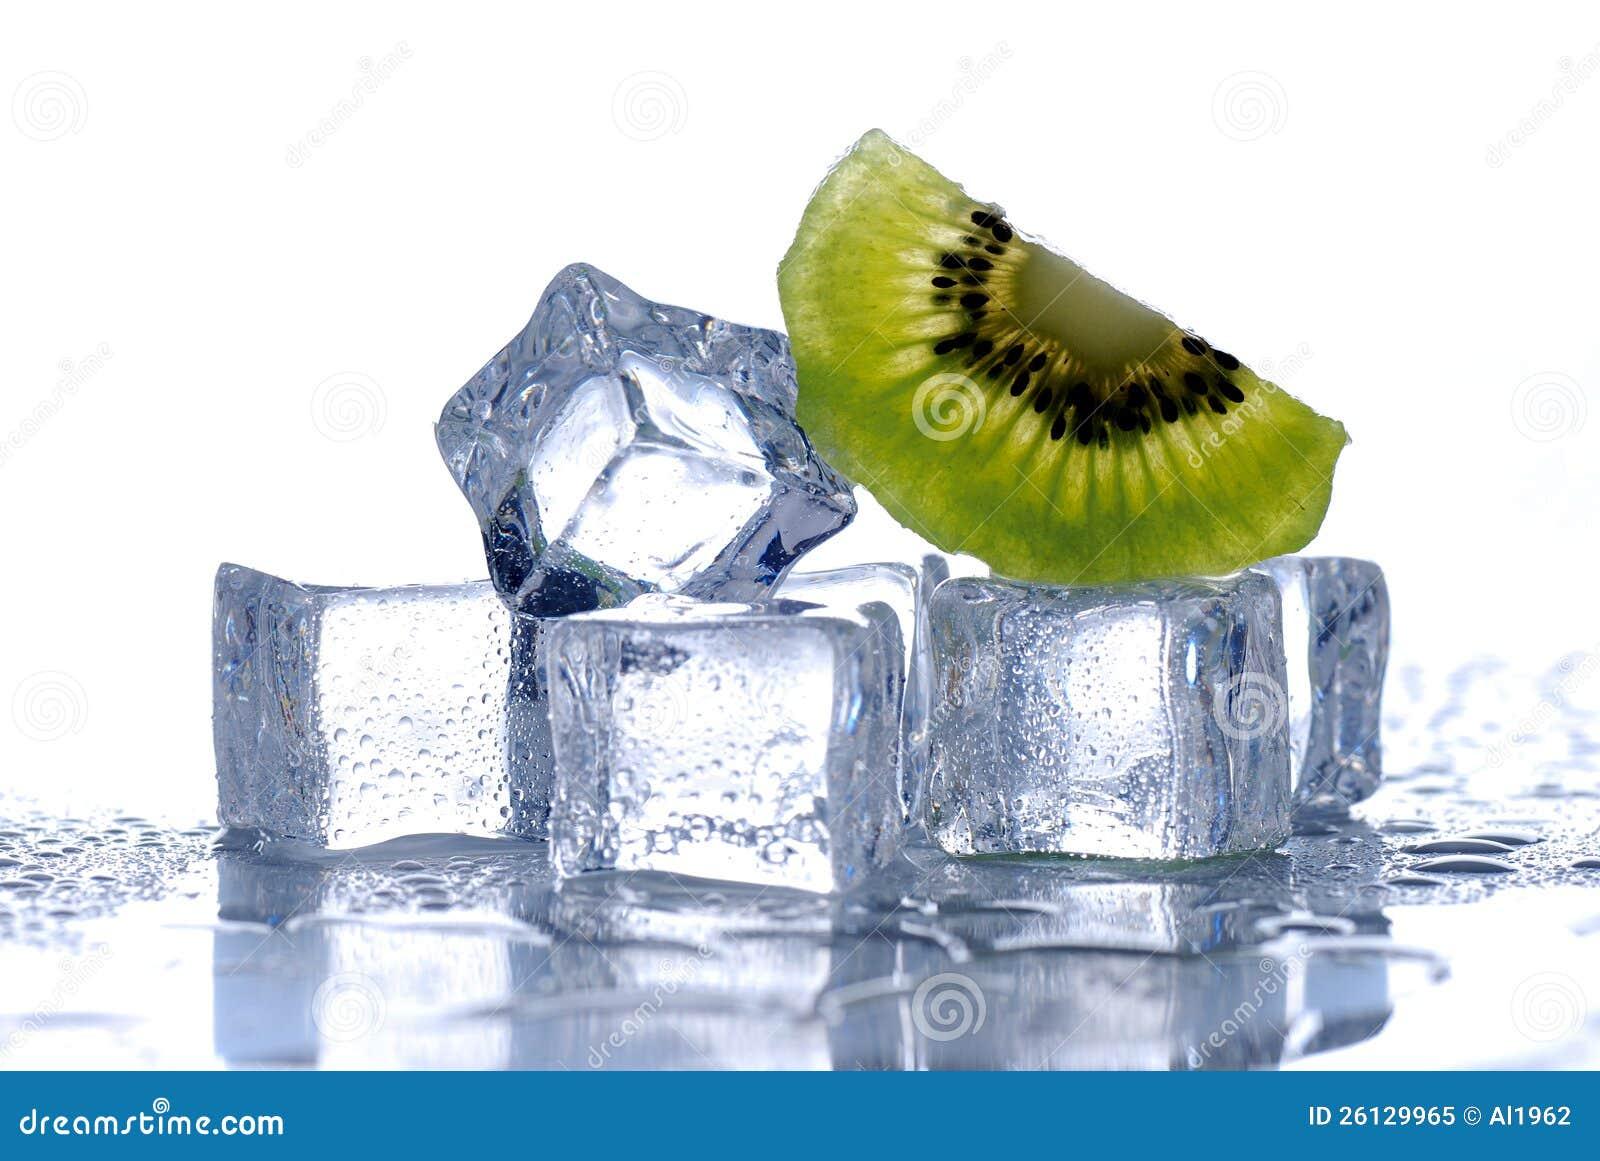 Кубики льда и киви